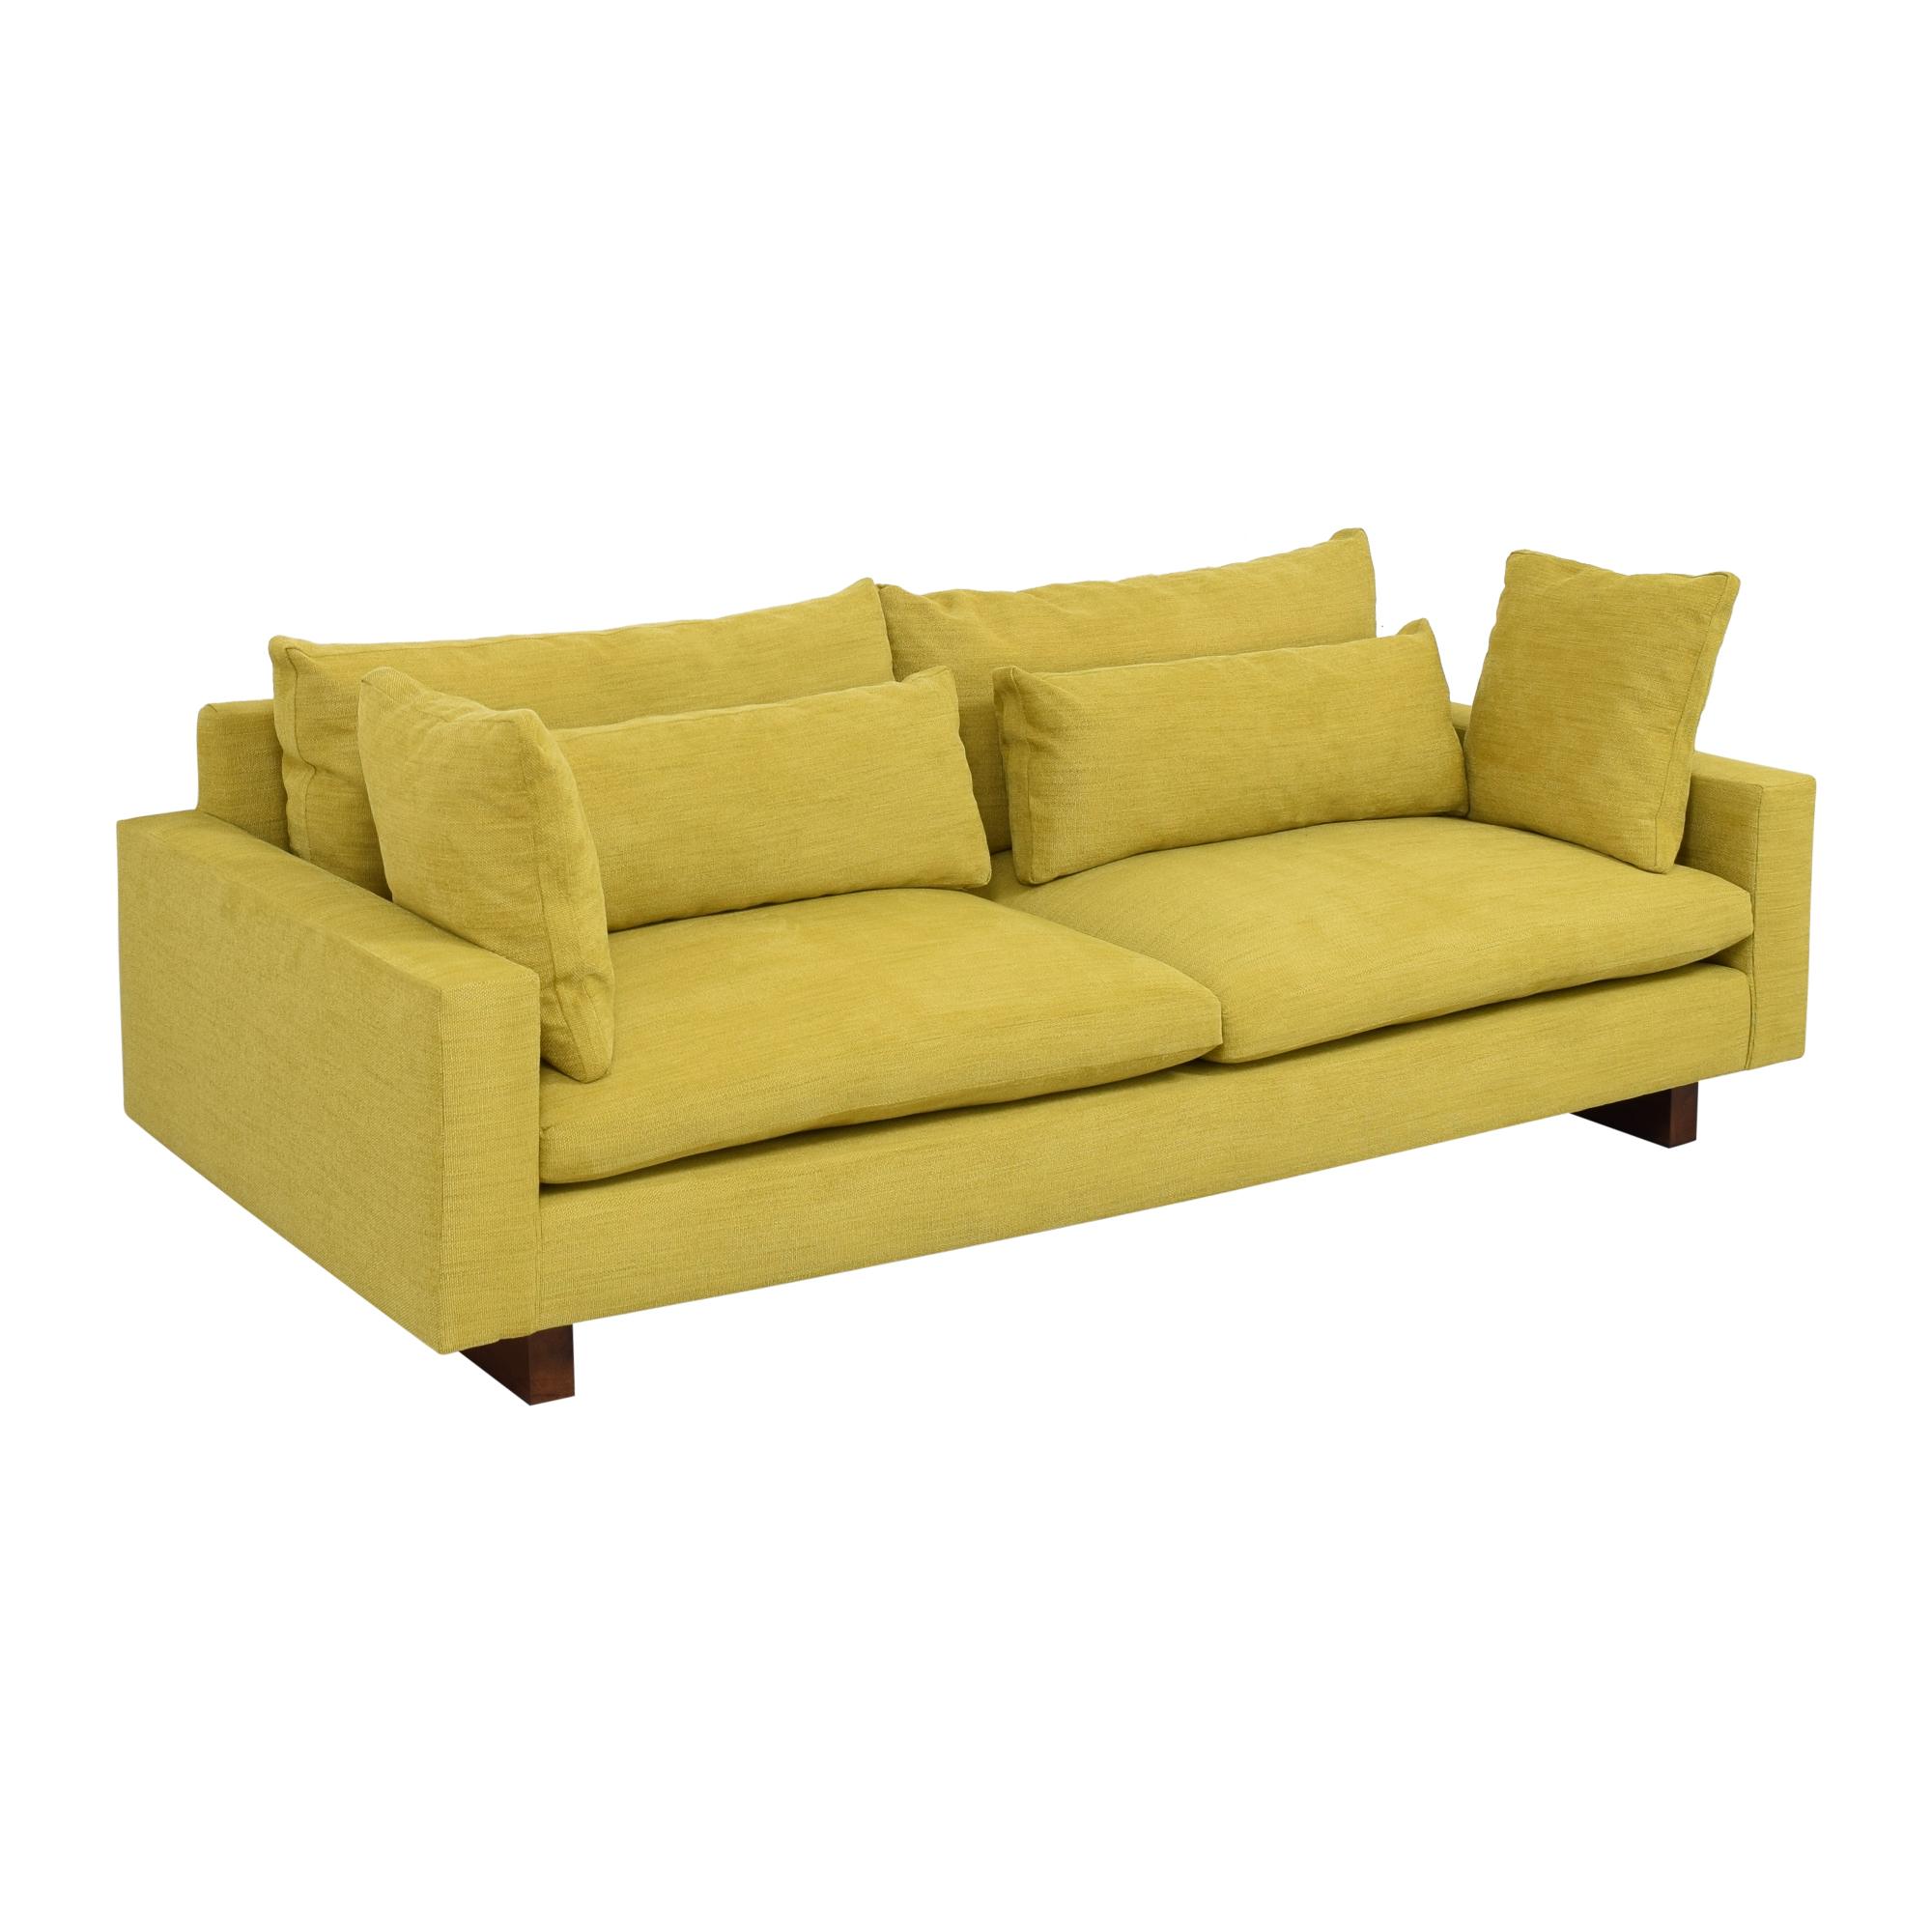 buy West Elm Harmony Two Cushion Sofa West Elm Classic Sofas